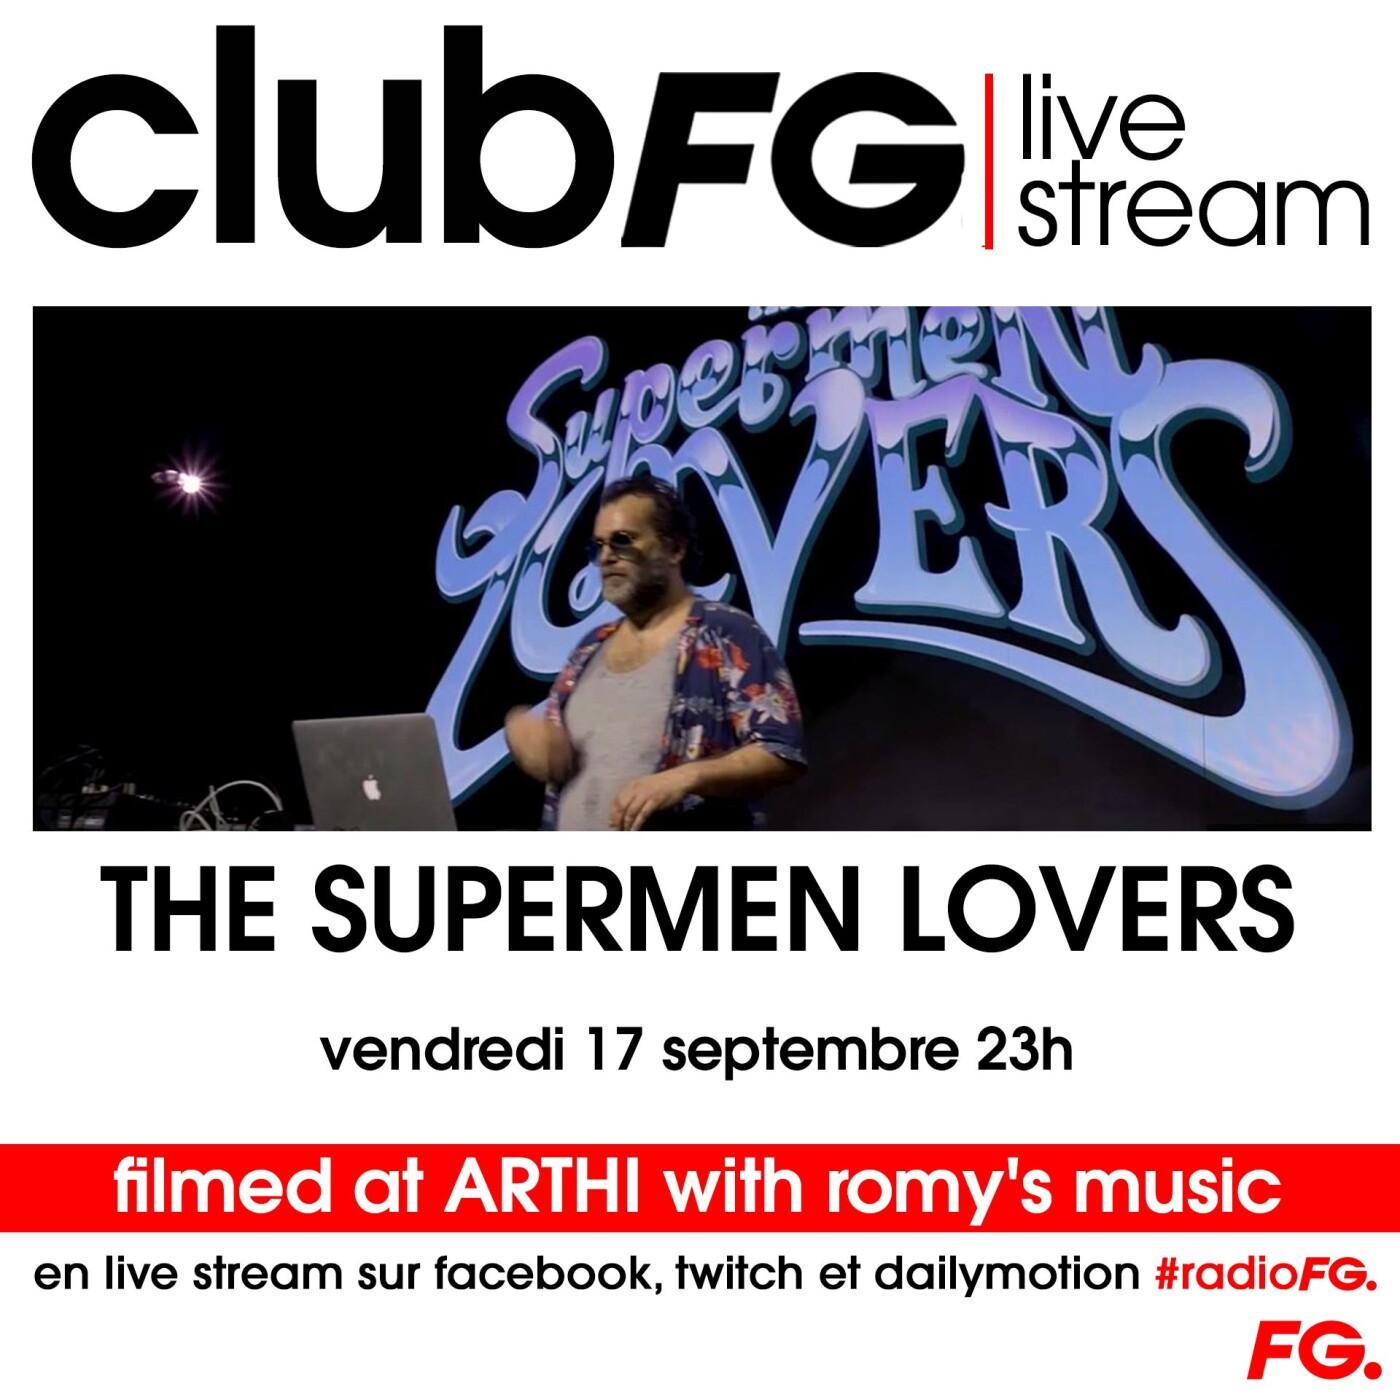 CLUB FG LIVE STREAM : THE SUPERMEN LOVERS